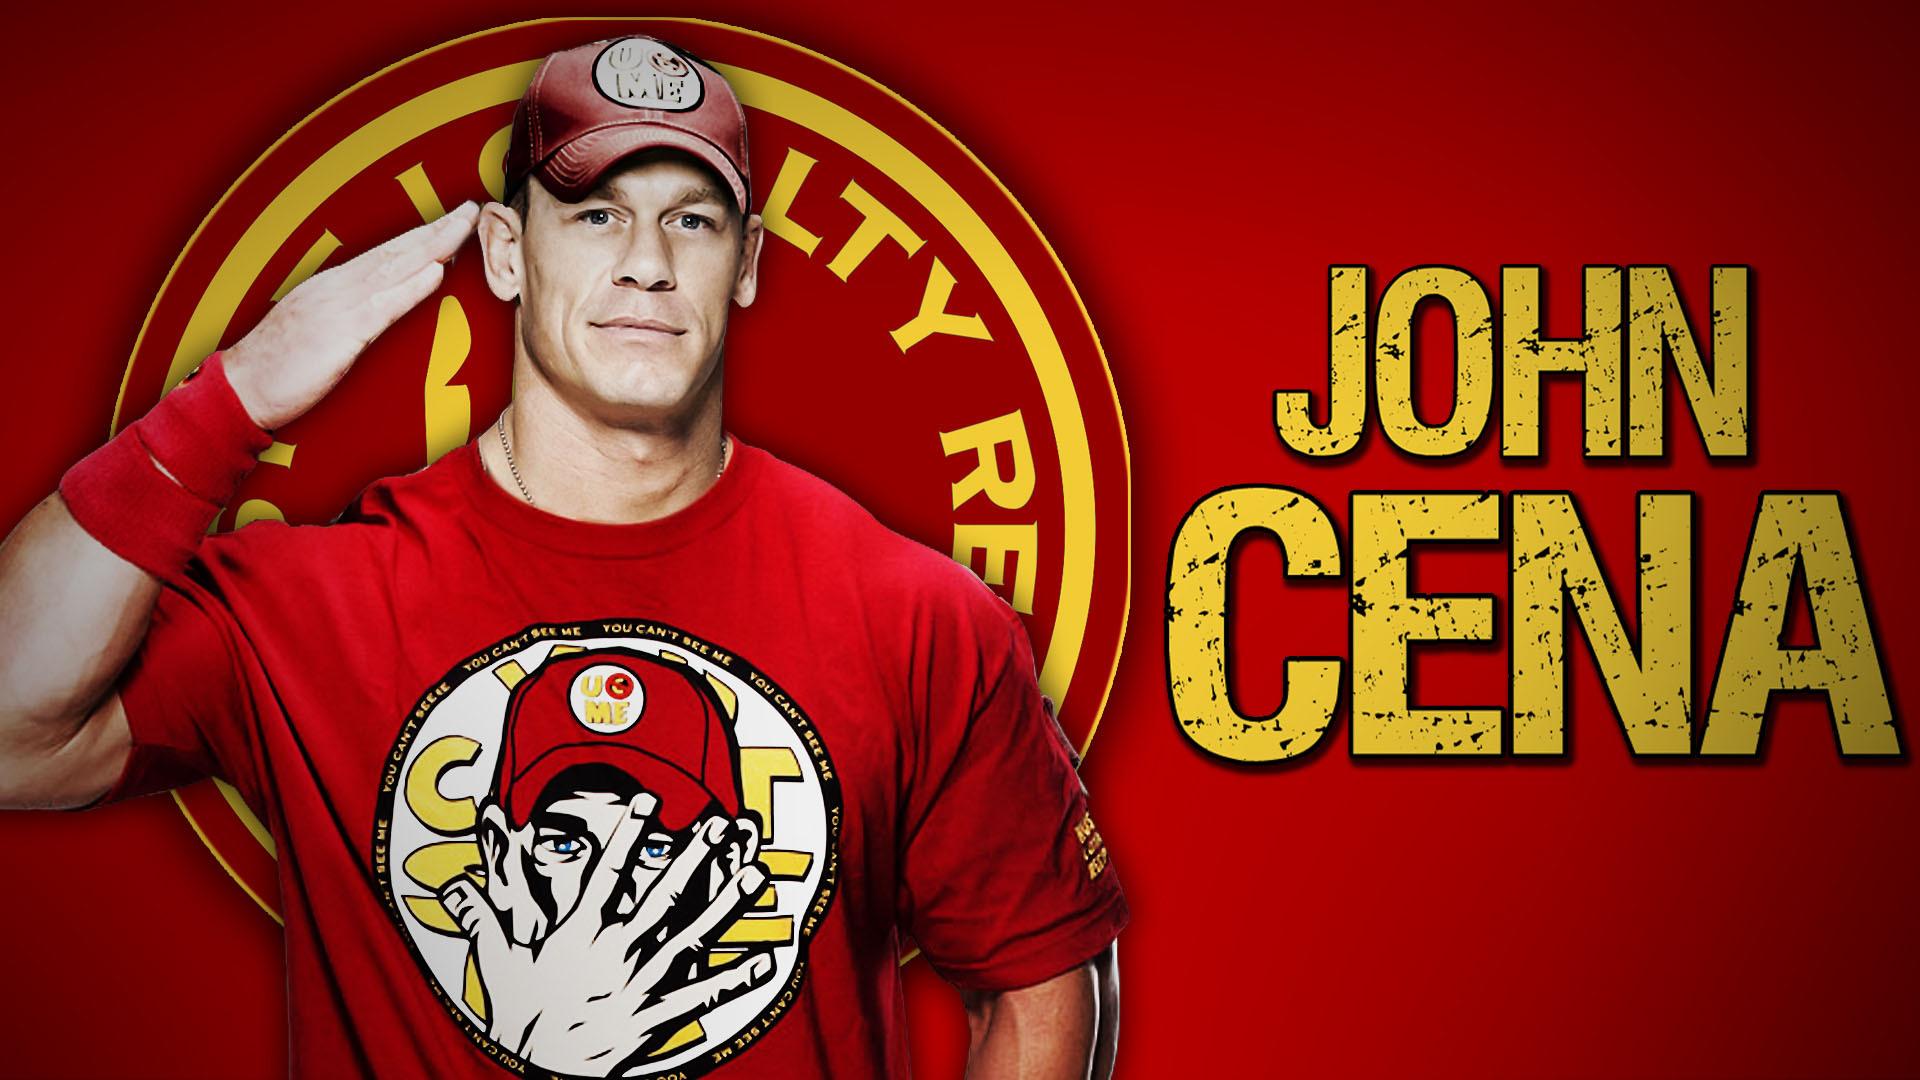 John Cena Free HD Wallpapers